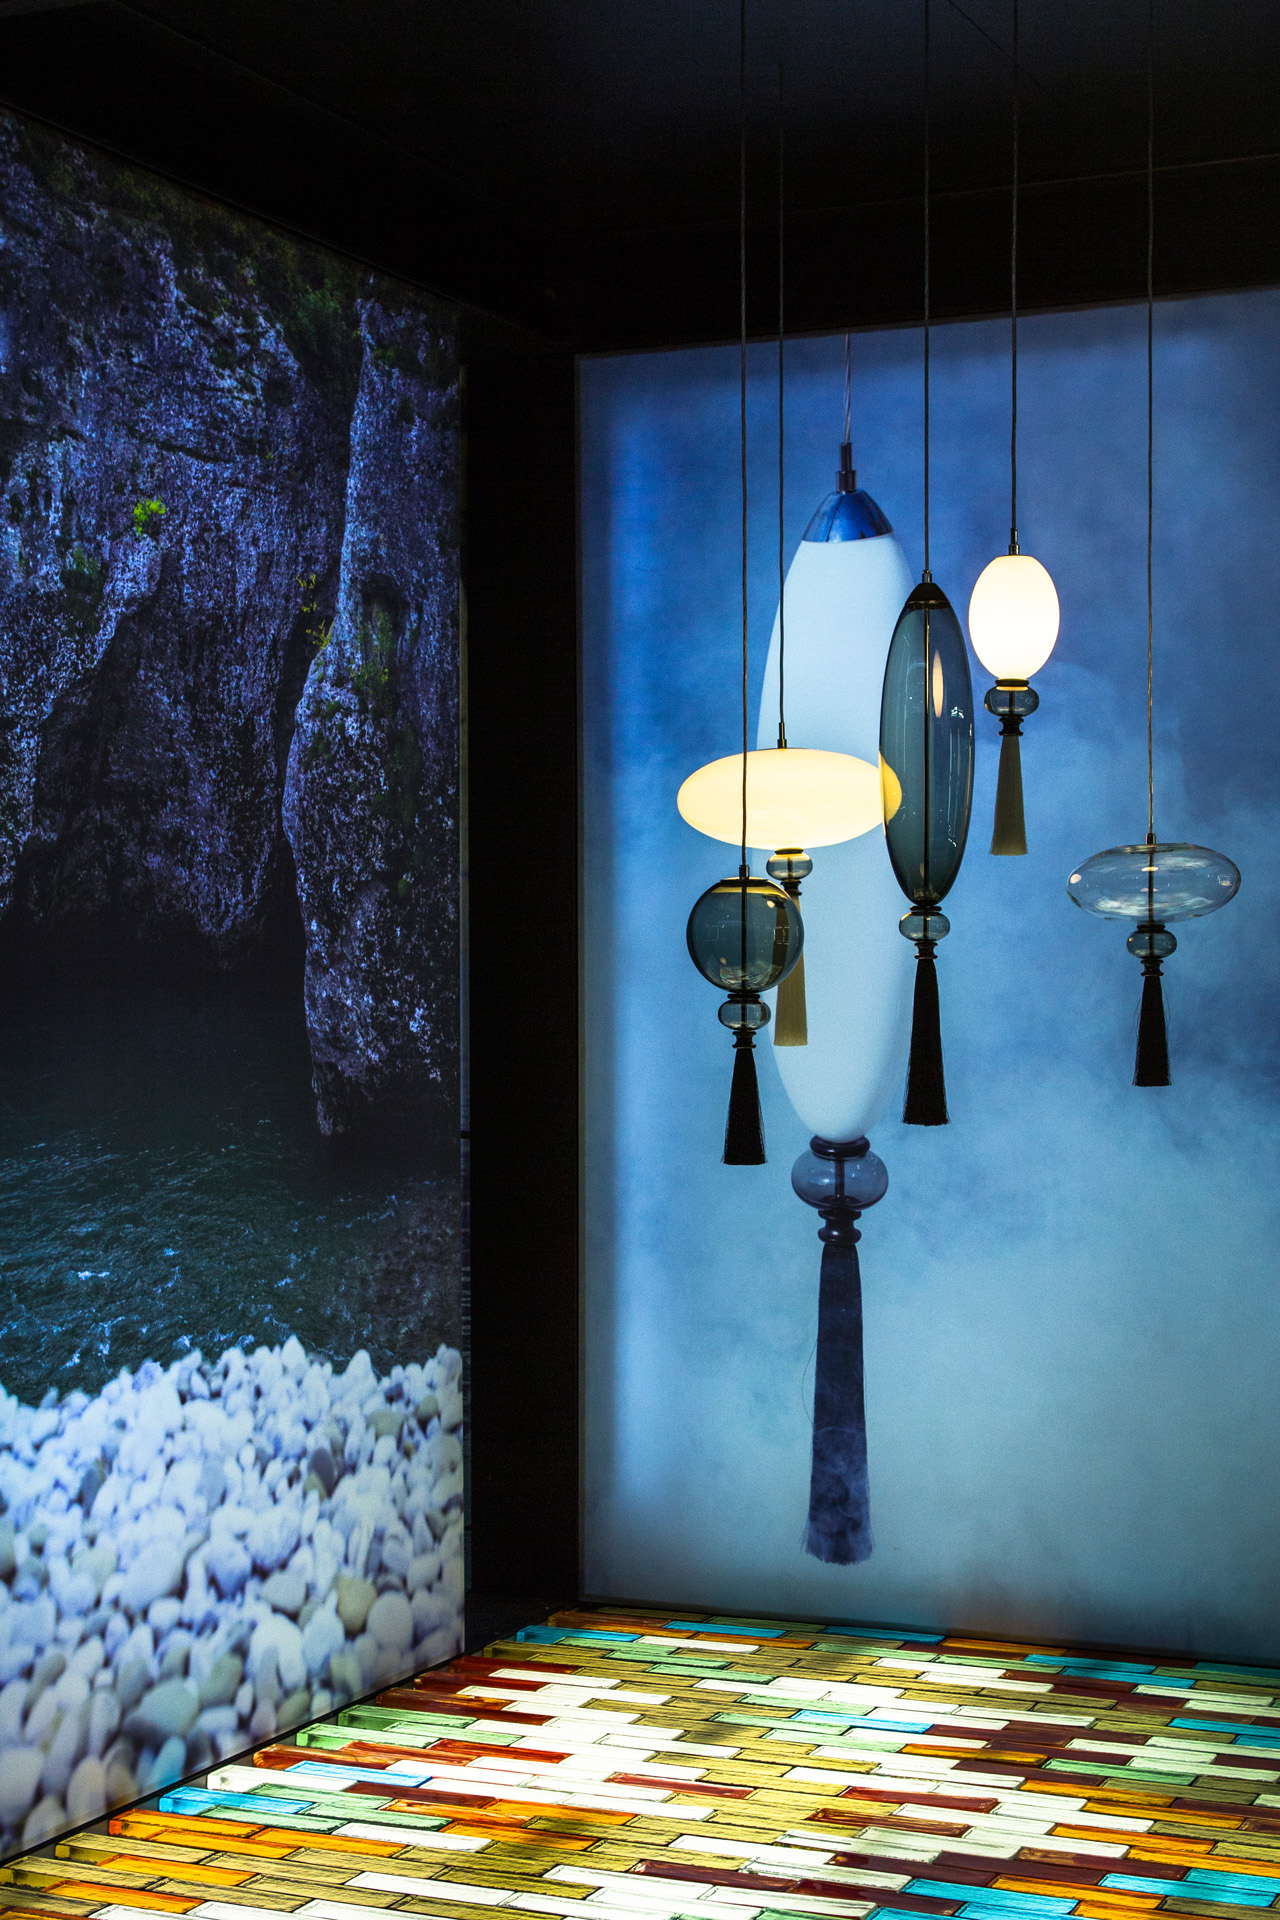 installation-cabinet-of-curiosities-studiopluz_5